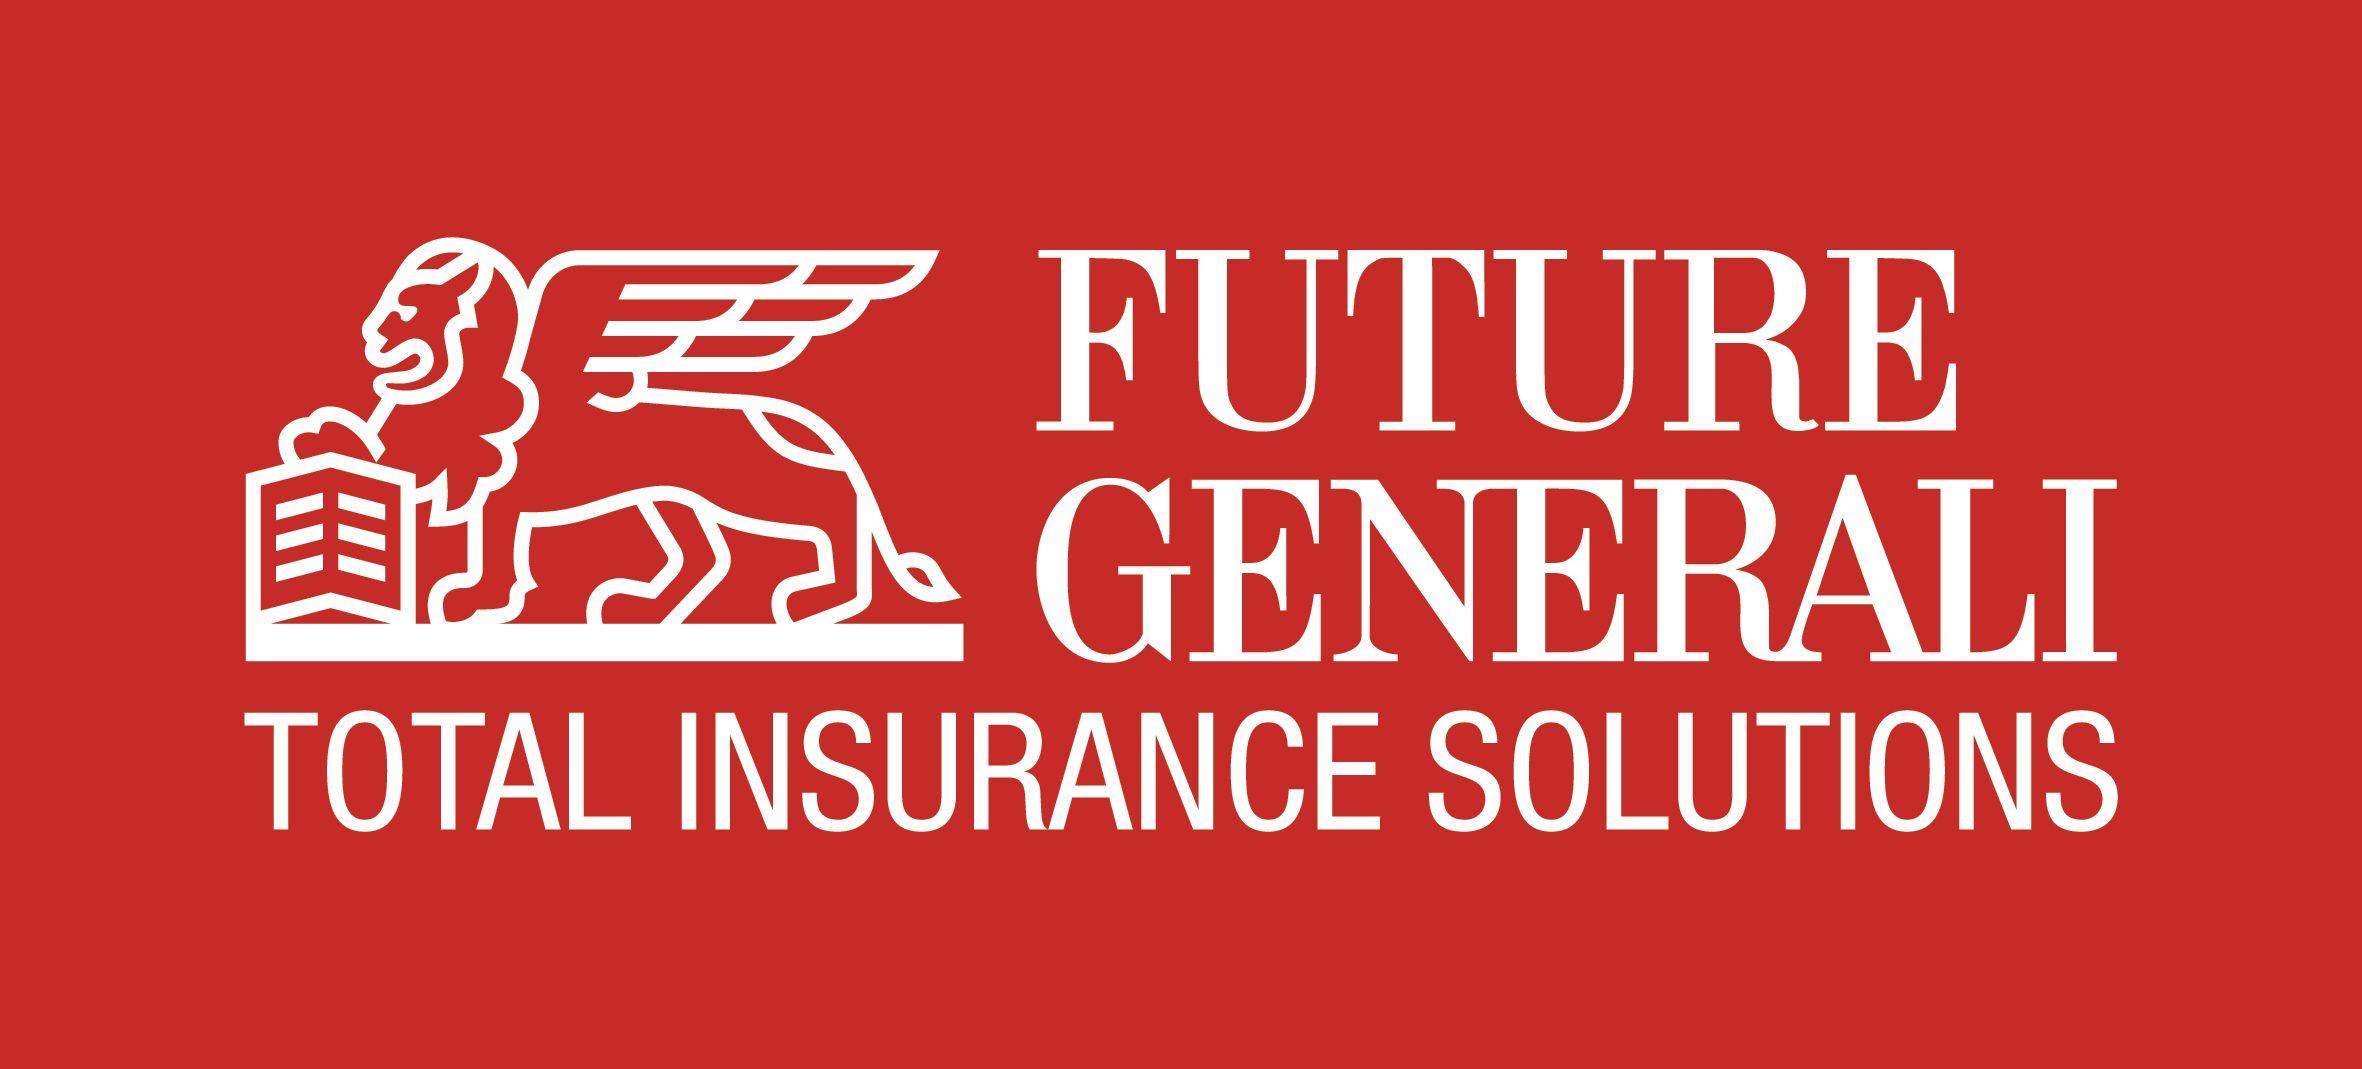 Future Generali Car Insurance Comparison General Insurance